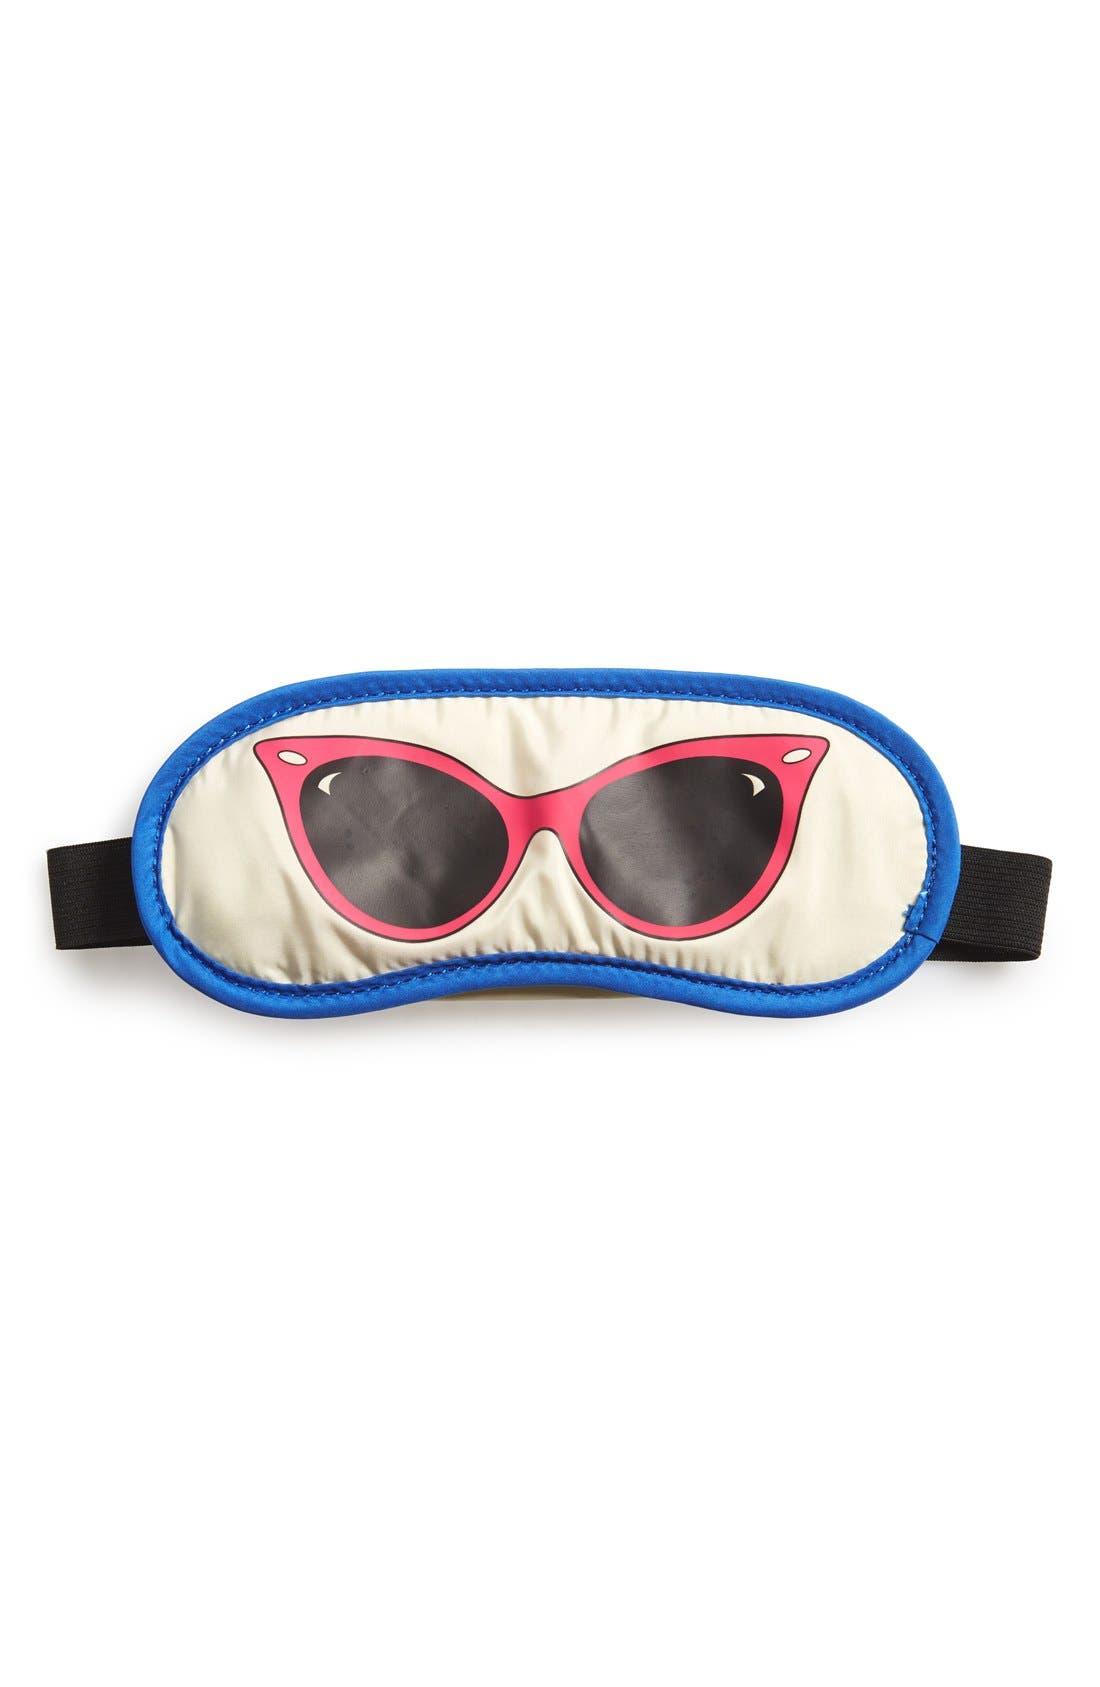 Alternate Image 1 Selected - FLIGHT 001 'Cat Eye Sunglasses' Sleep Mask